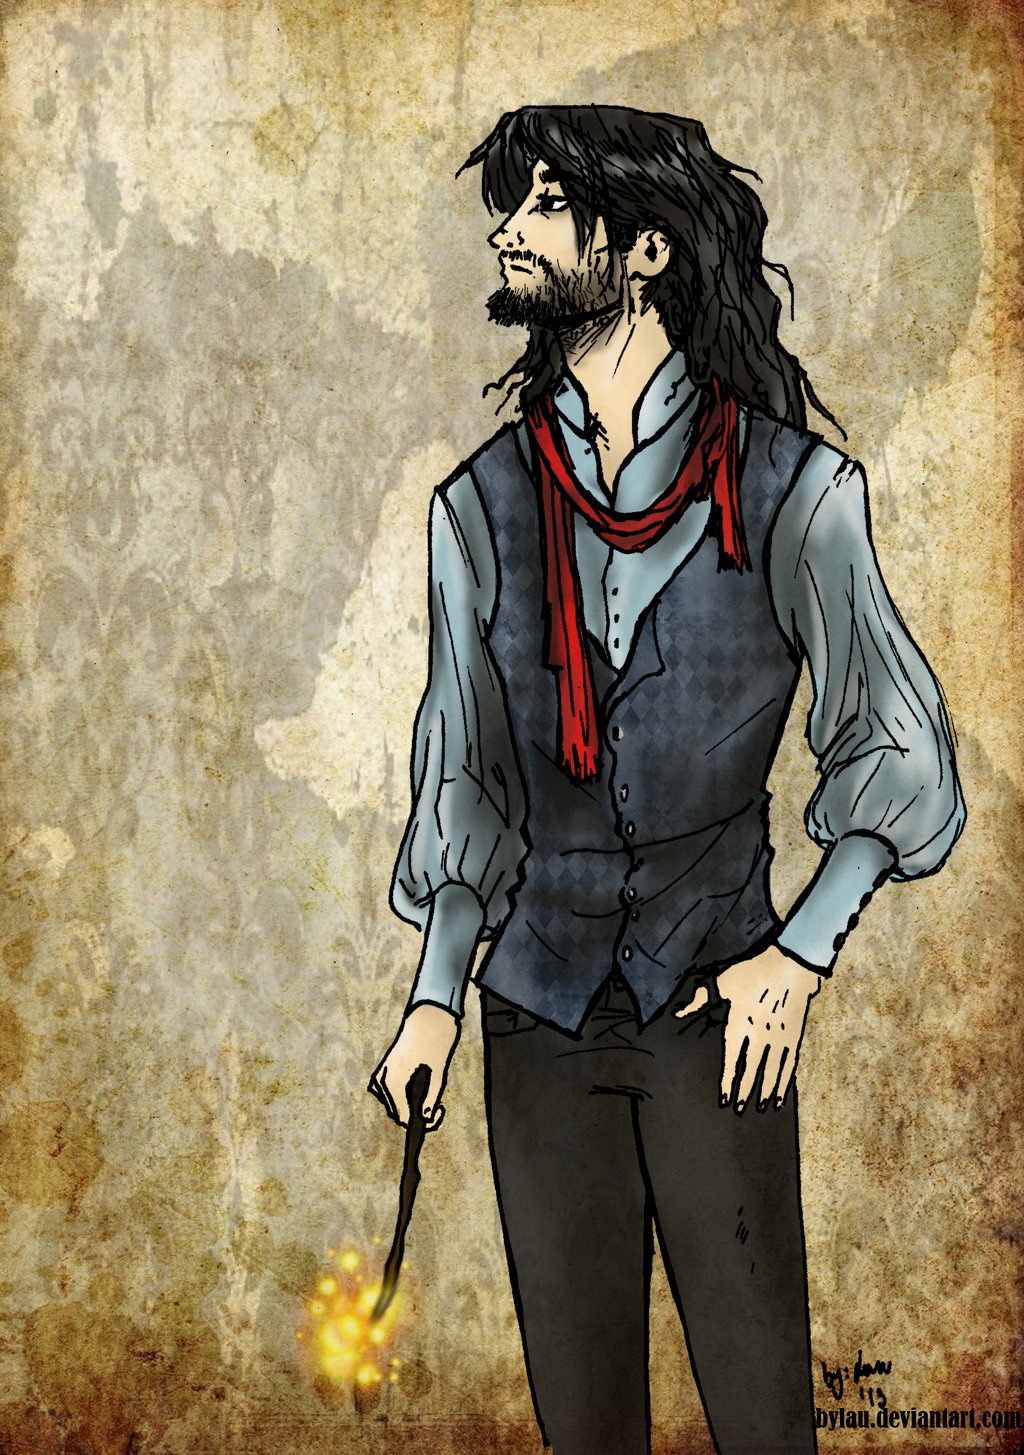 Sirius Black New Design By ByLau On DeviantArt